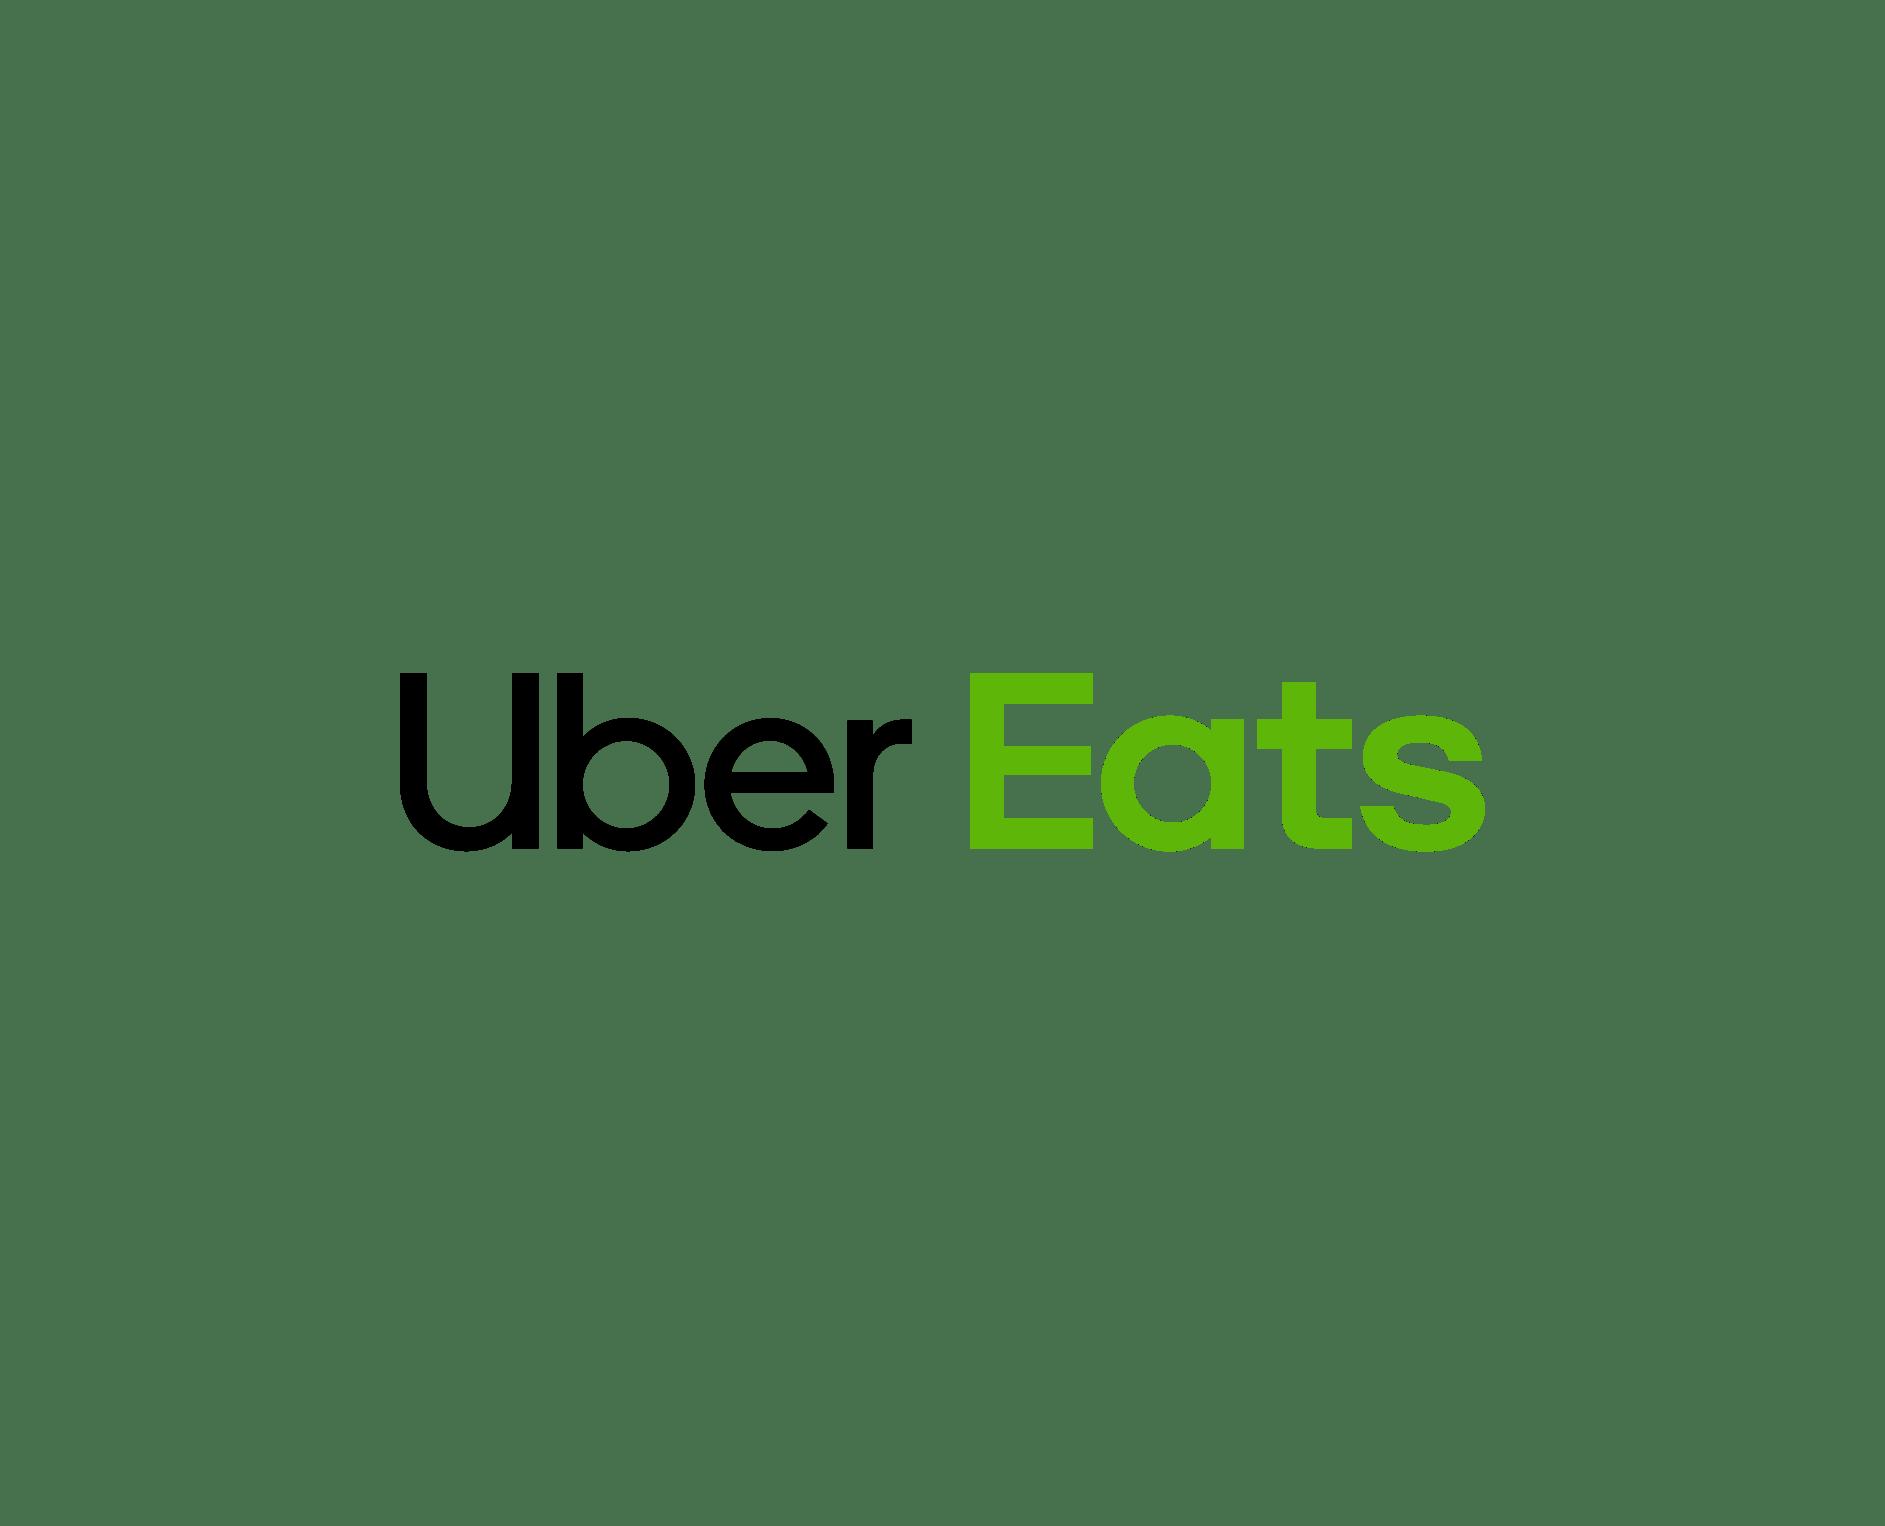 uber-eats-hot-chicken.png